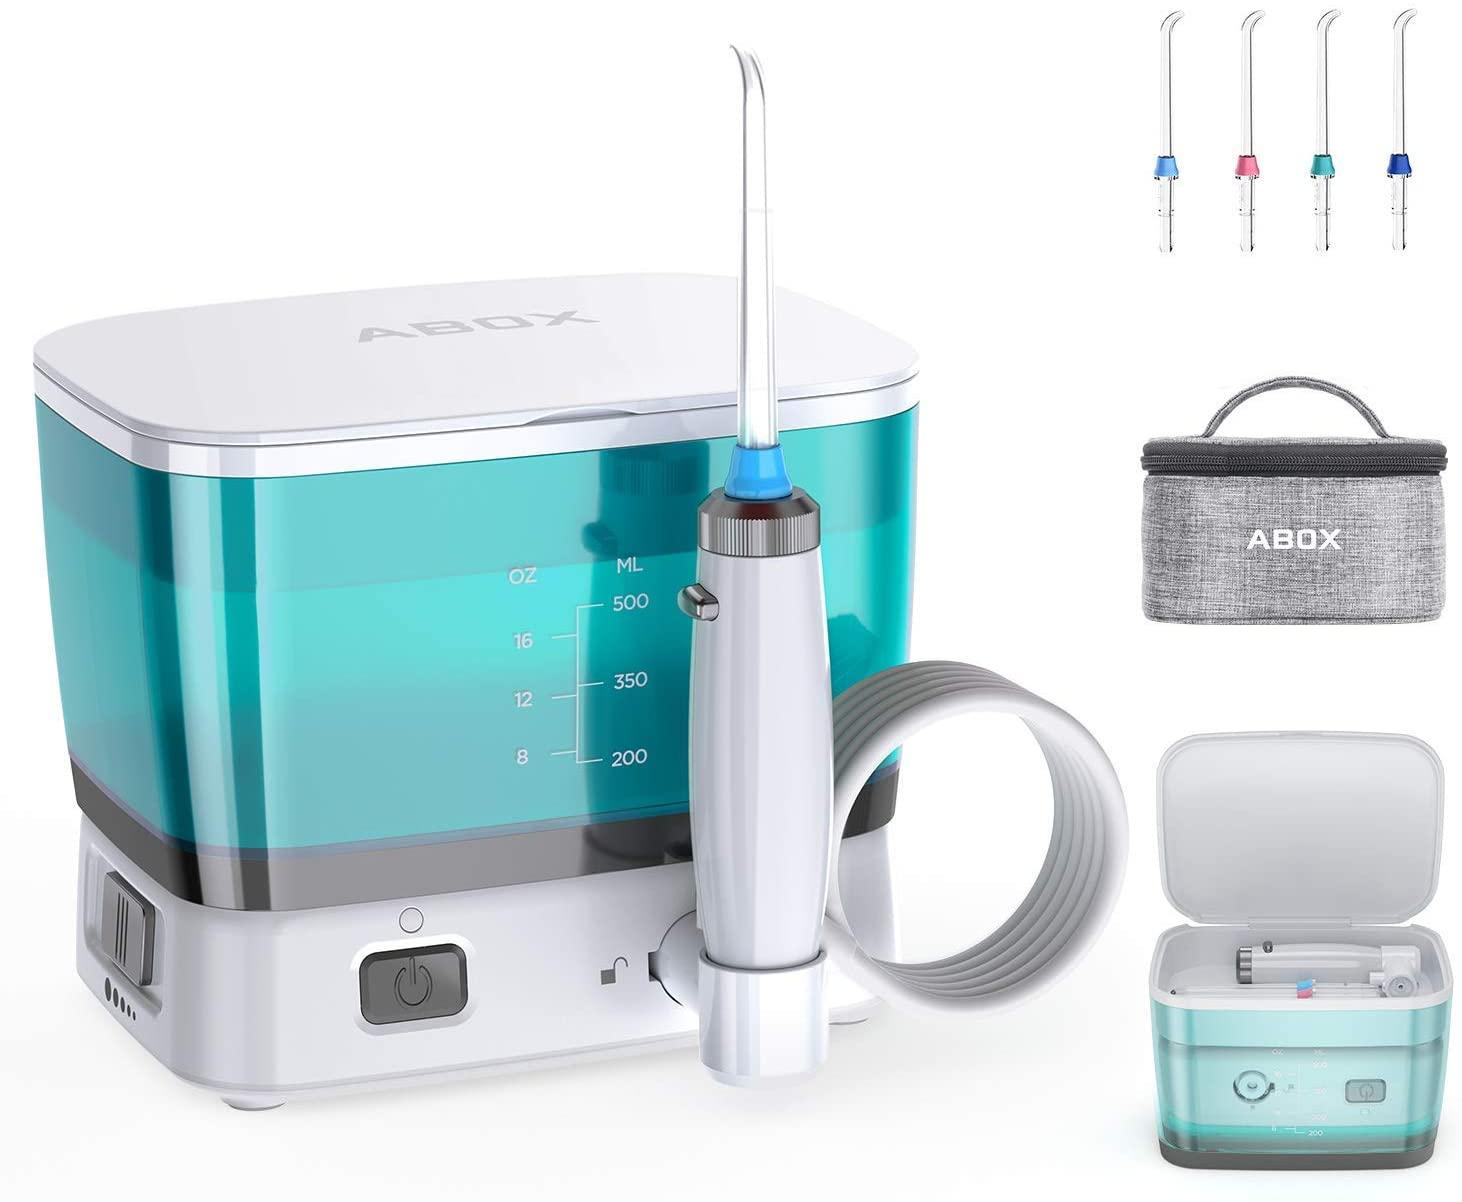 Hydropulseur rechargeable Abox FC2580 - 500 ml (Vendeur Tiers)